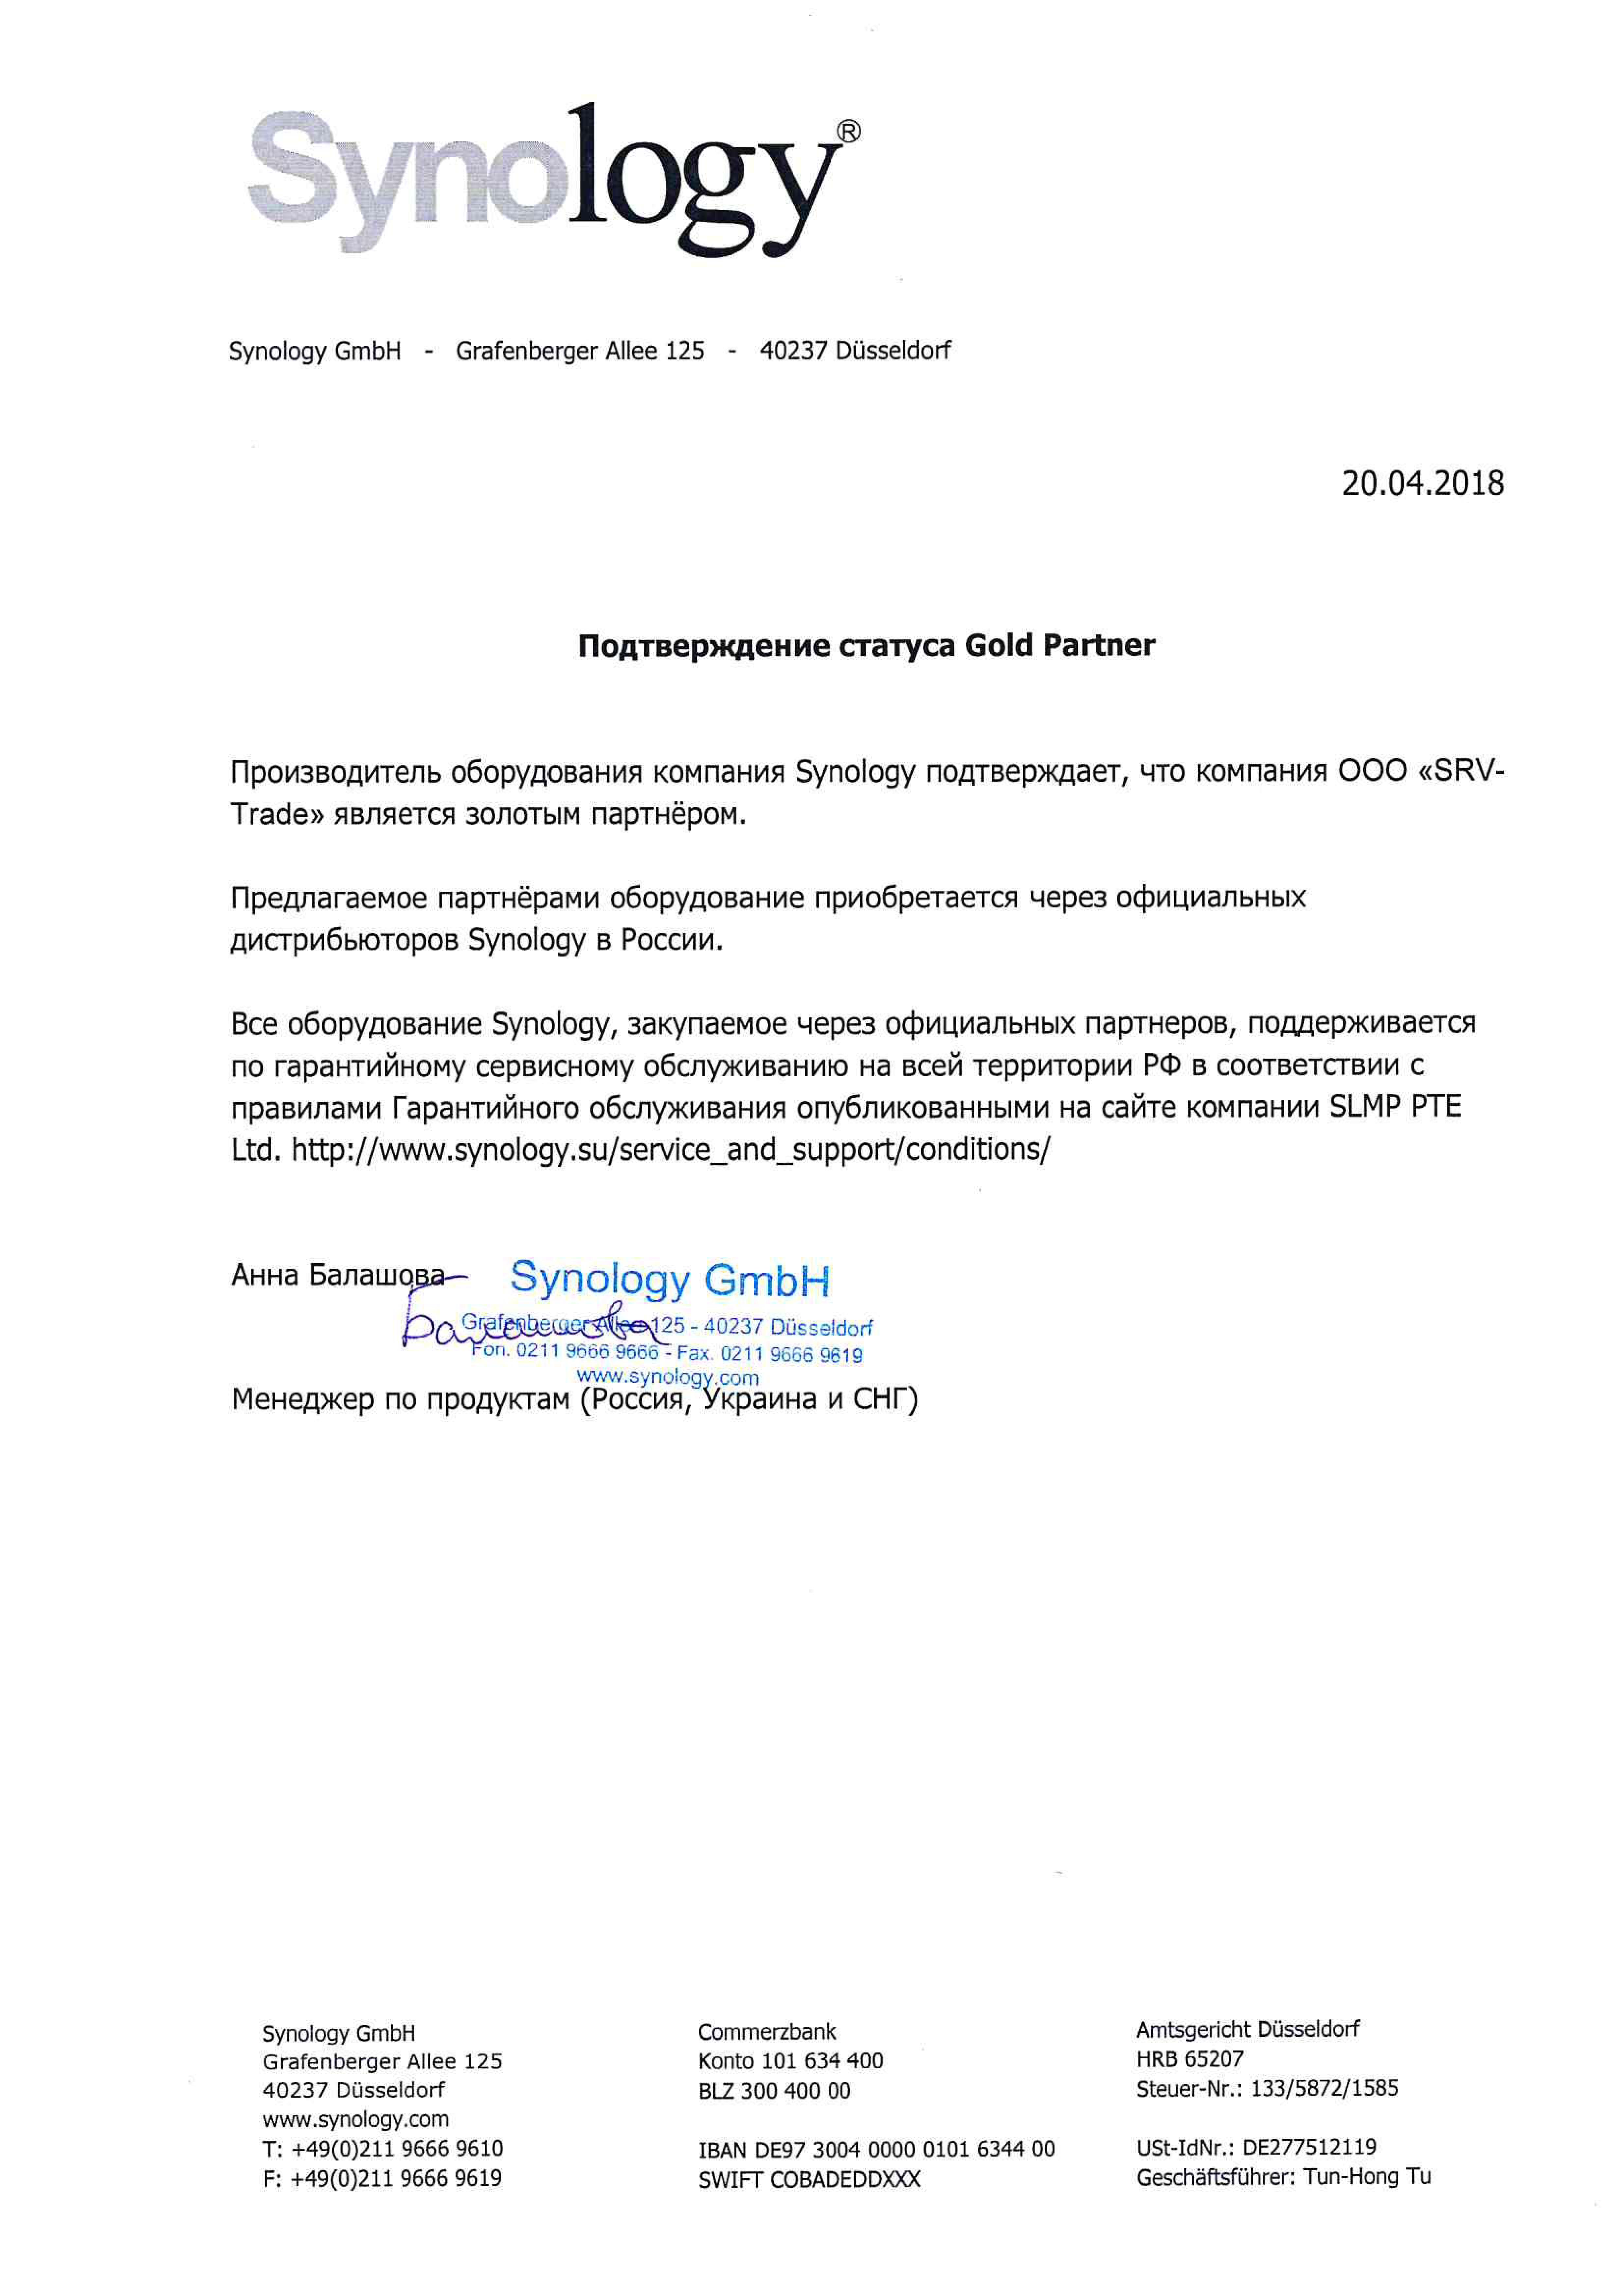 Сертификат SRV-TRADE как партнера Synology